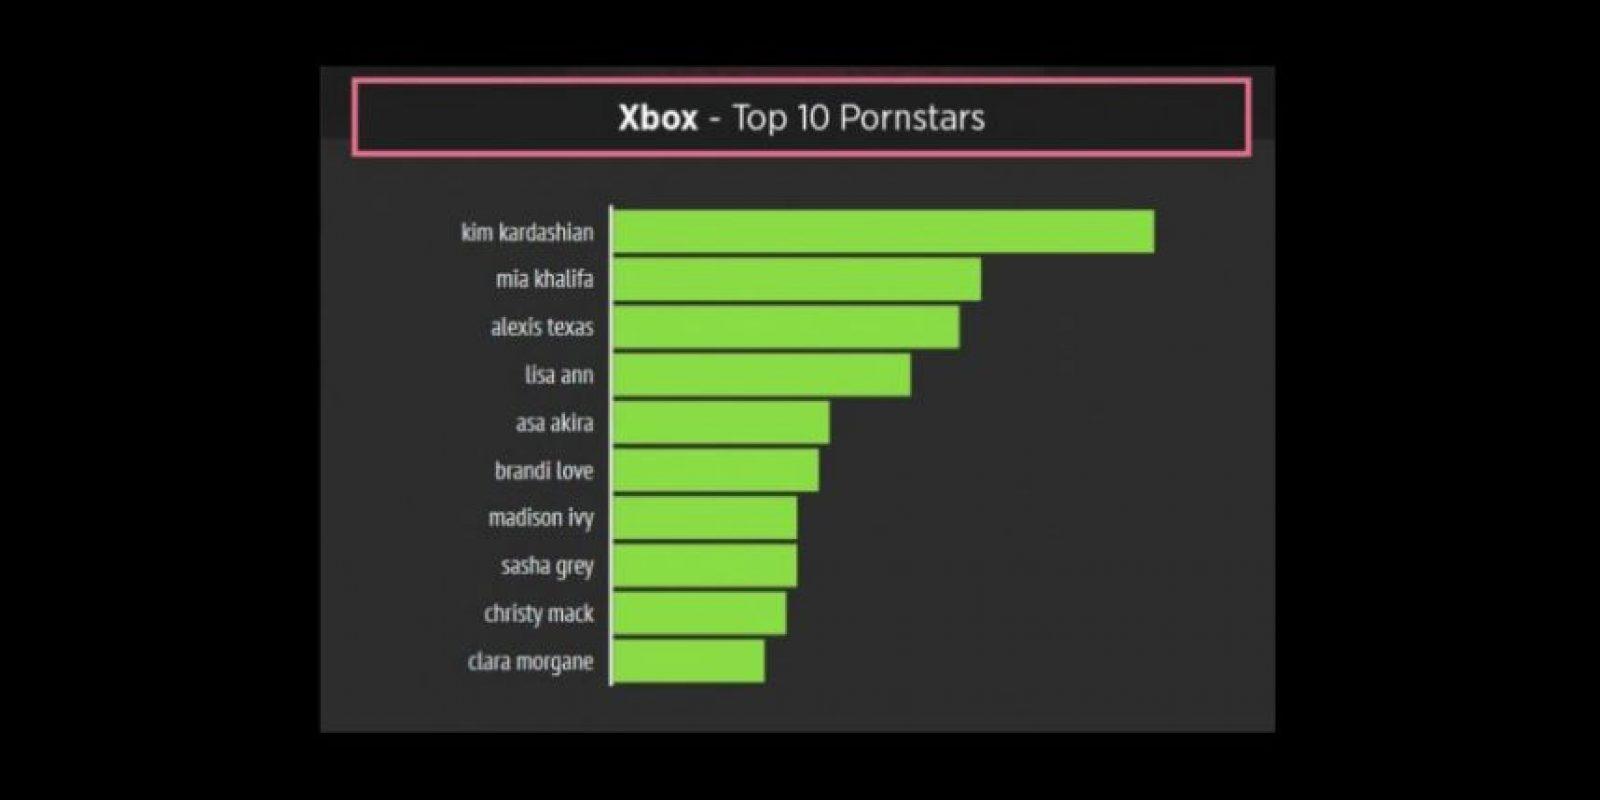 Preferencias de usuarios de Xbox Foto:YouPorn.com/world